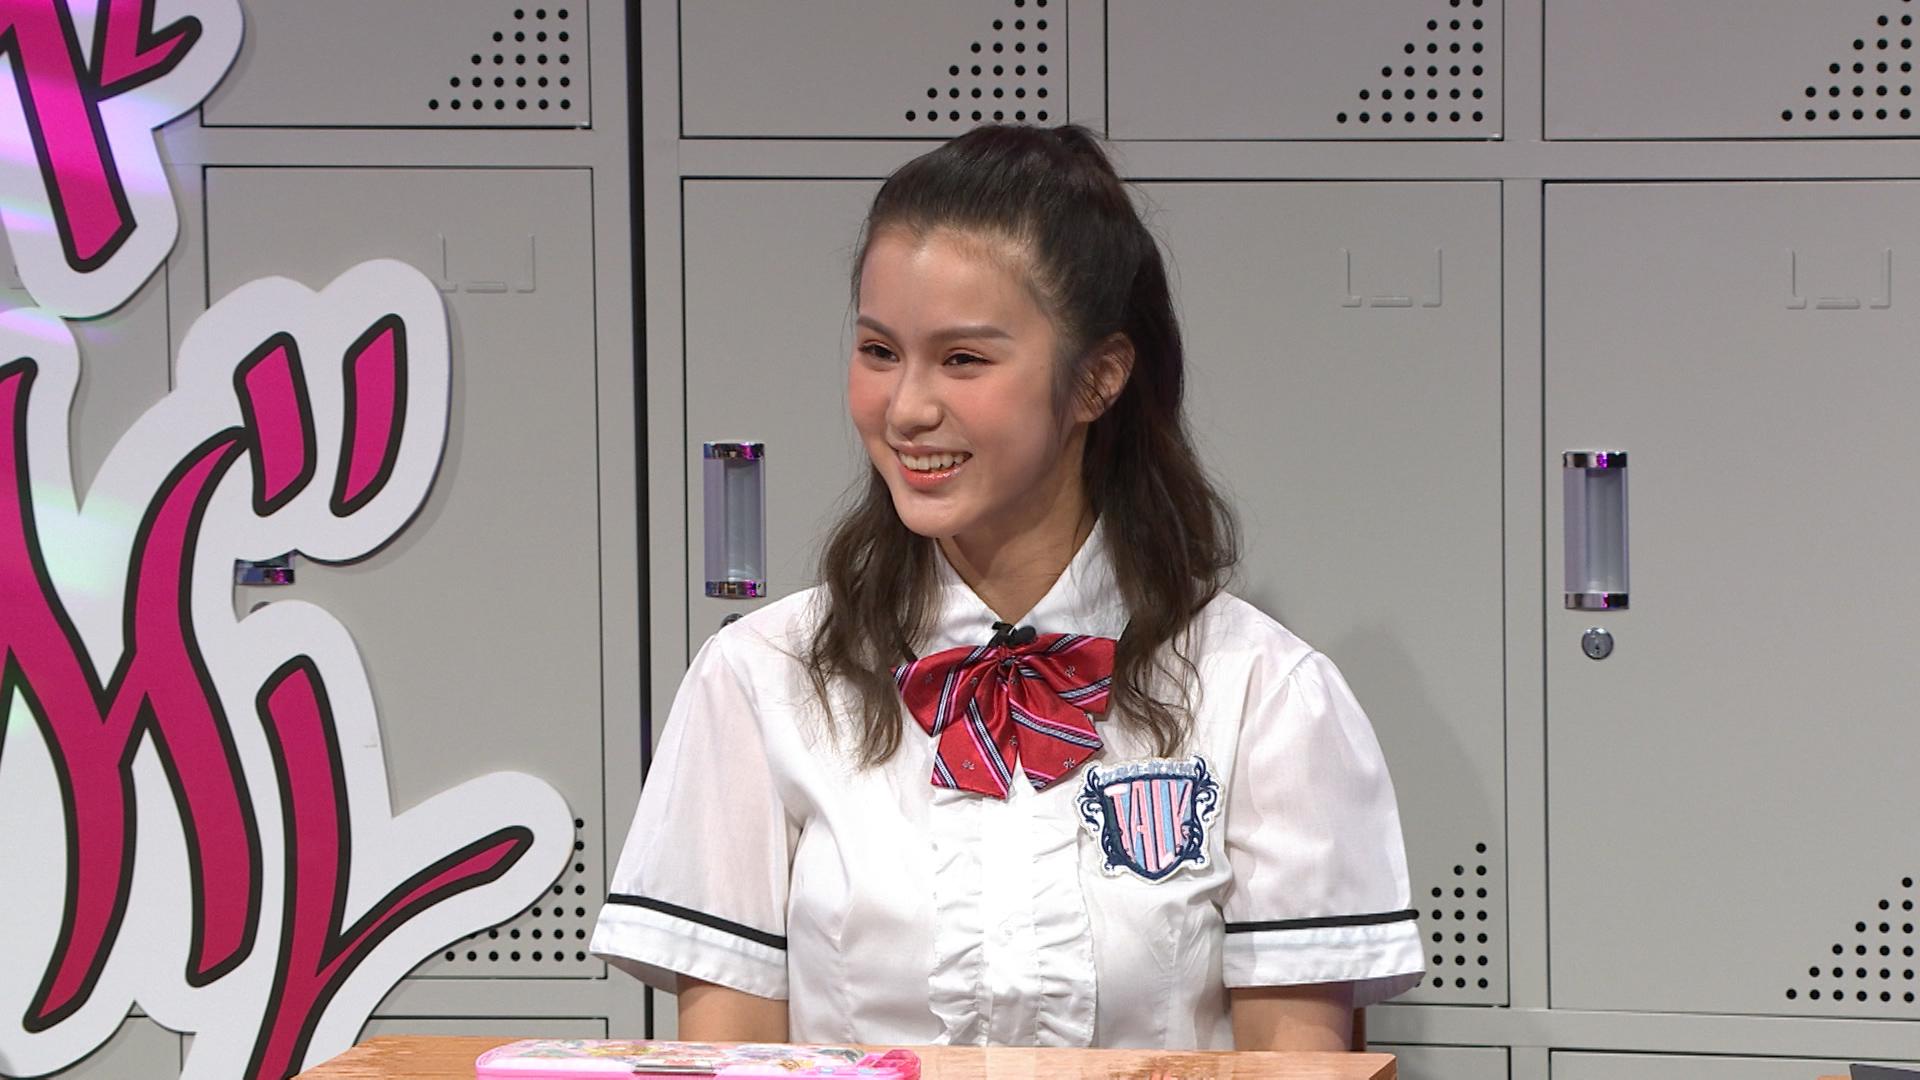 ViuTV節目《晚吹-女學生‧吹水班》請來鄧月平擔任嘉賓。